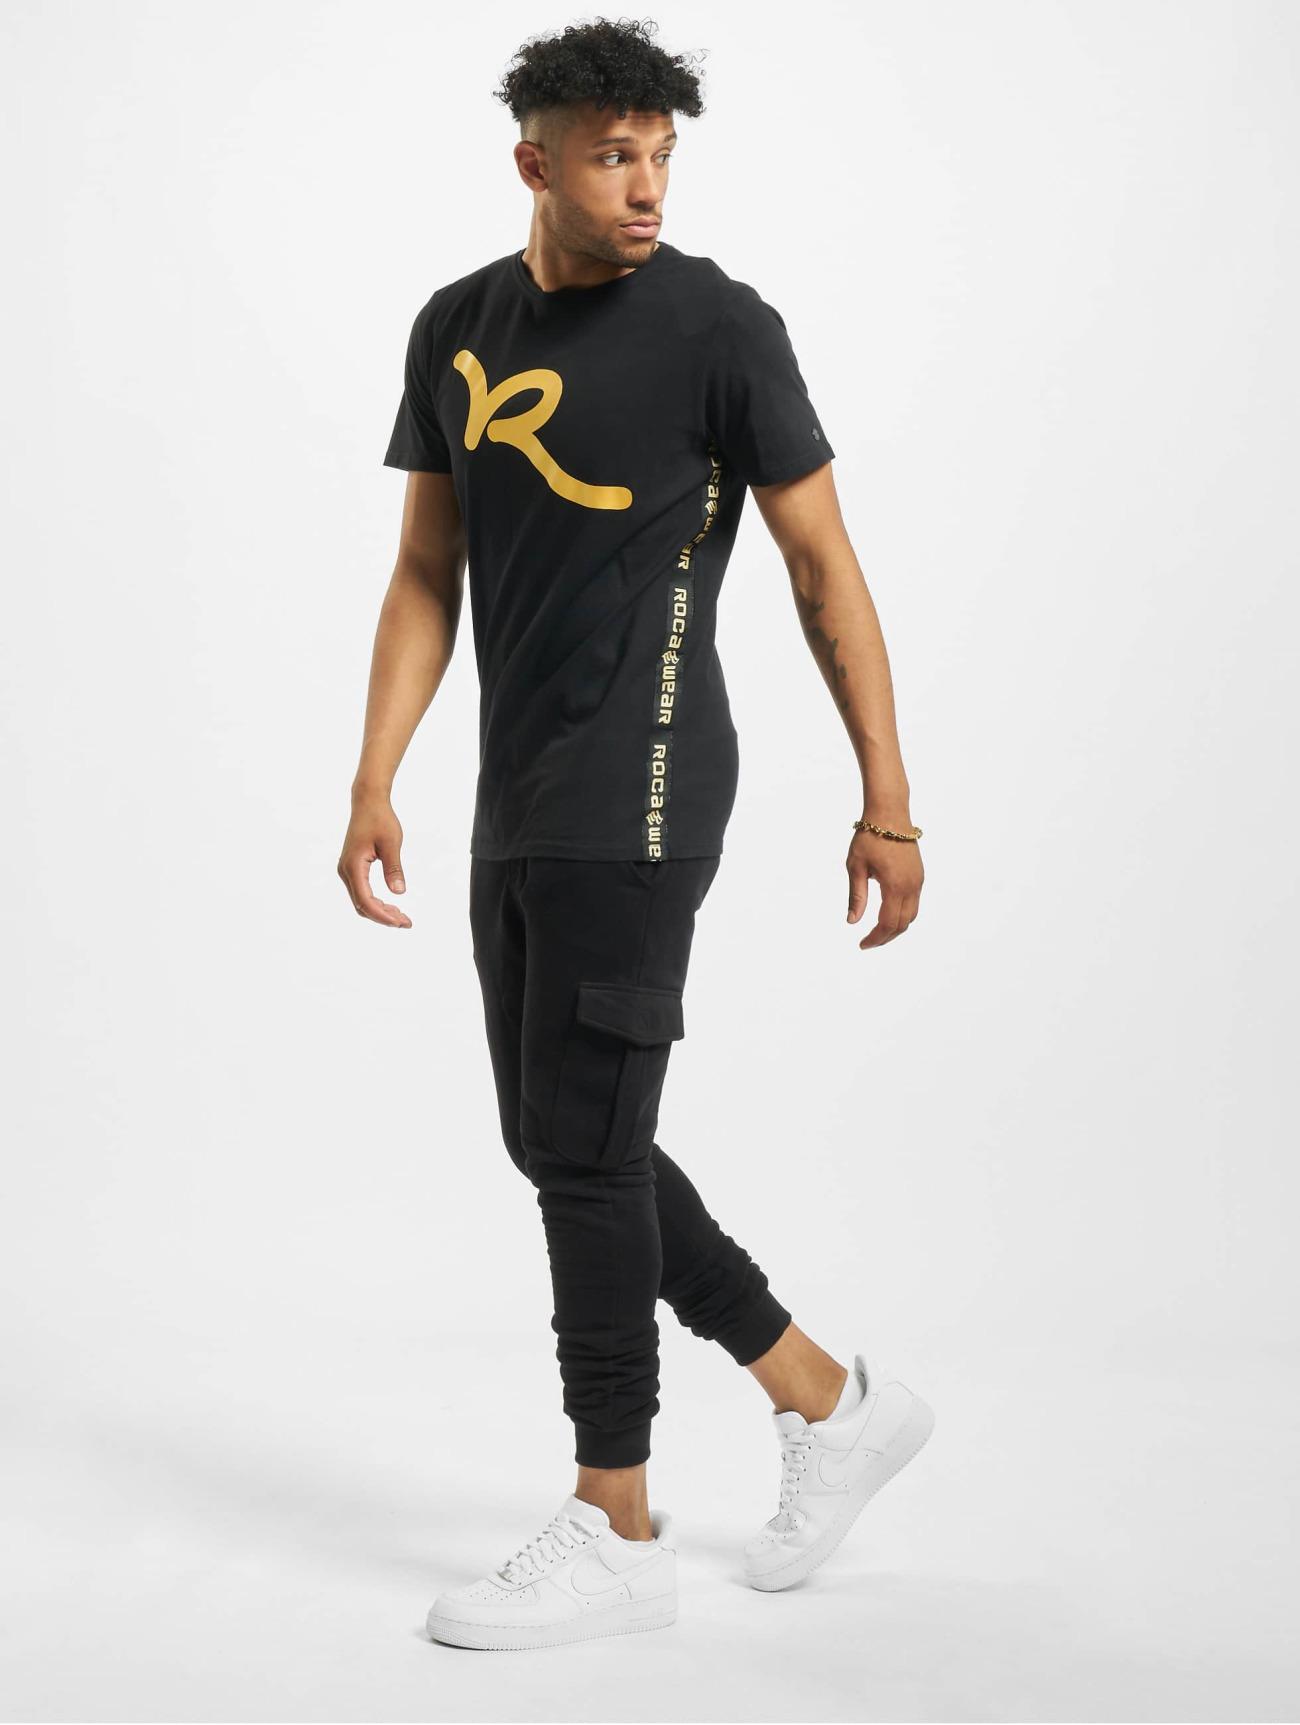 Rocawear | Midas   noir Homme T-Shirt  648147| Homme Hauts